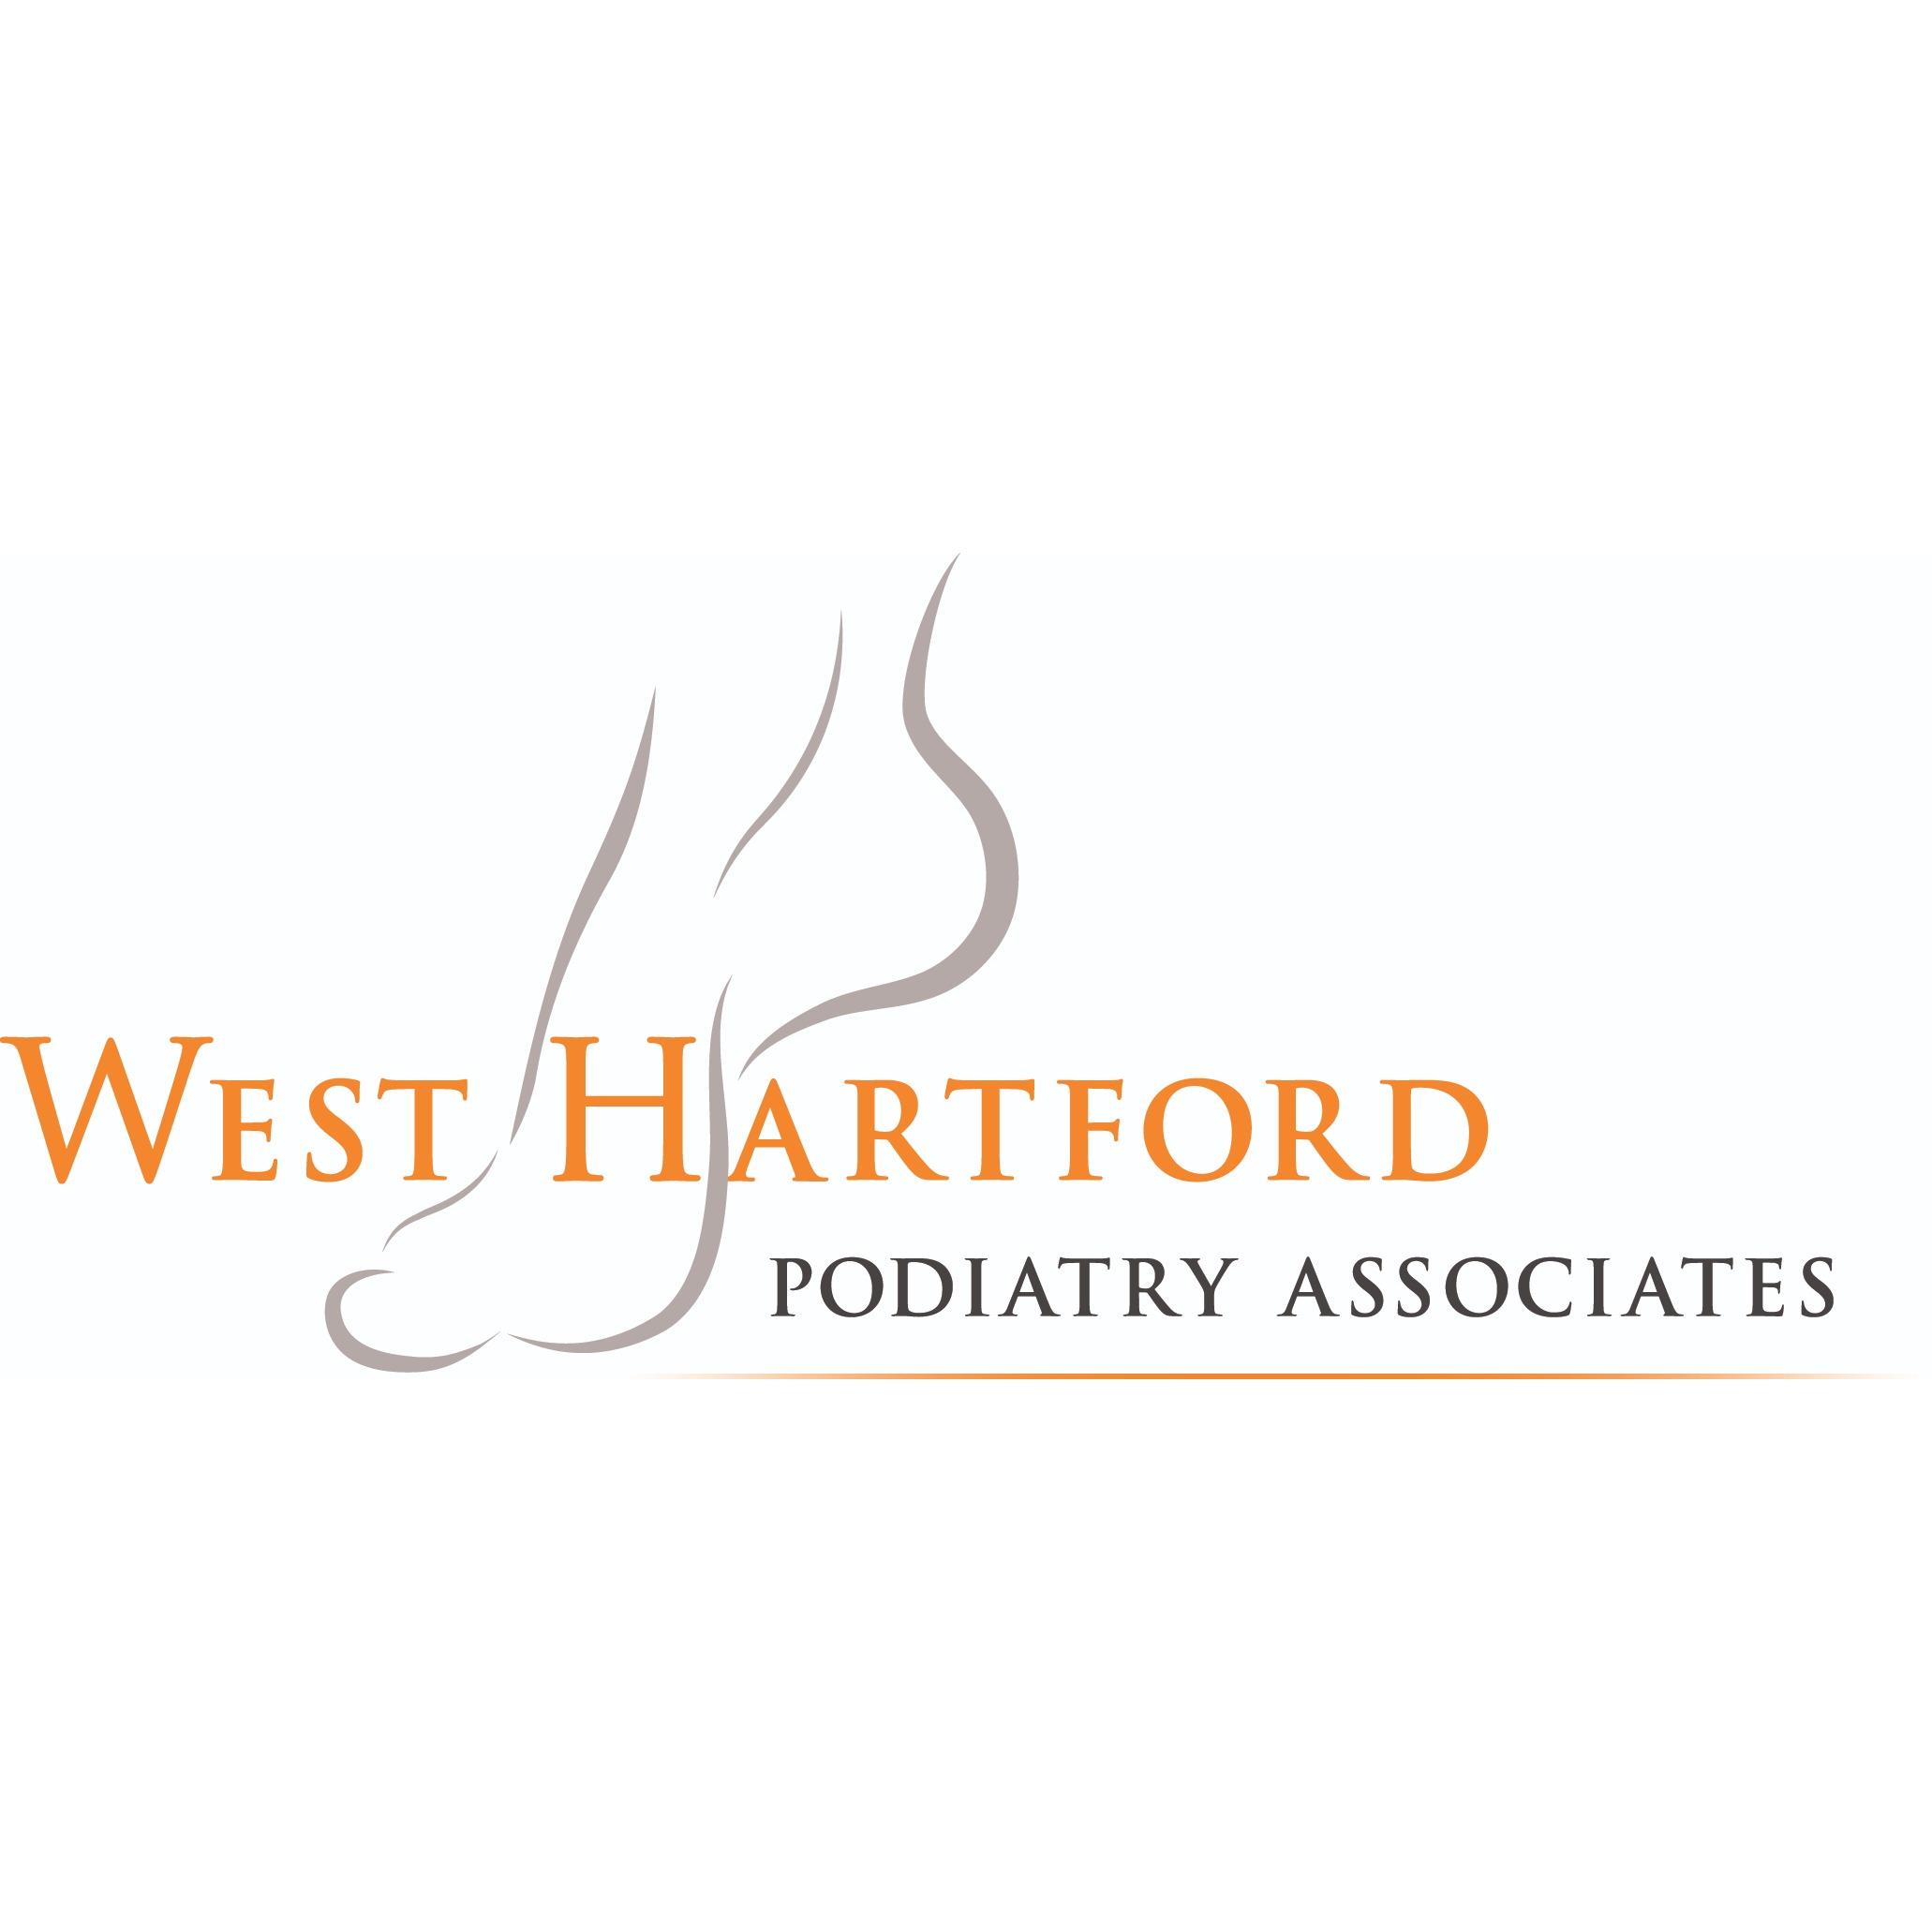 West Hartford Podiatry Associates